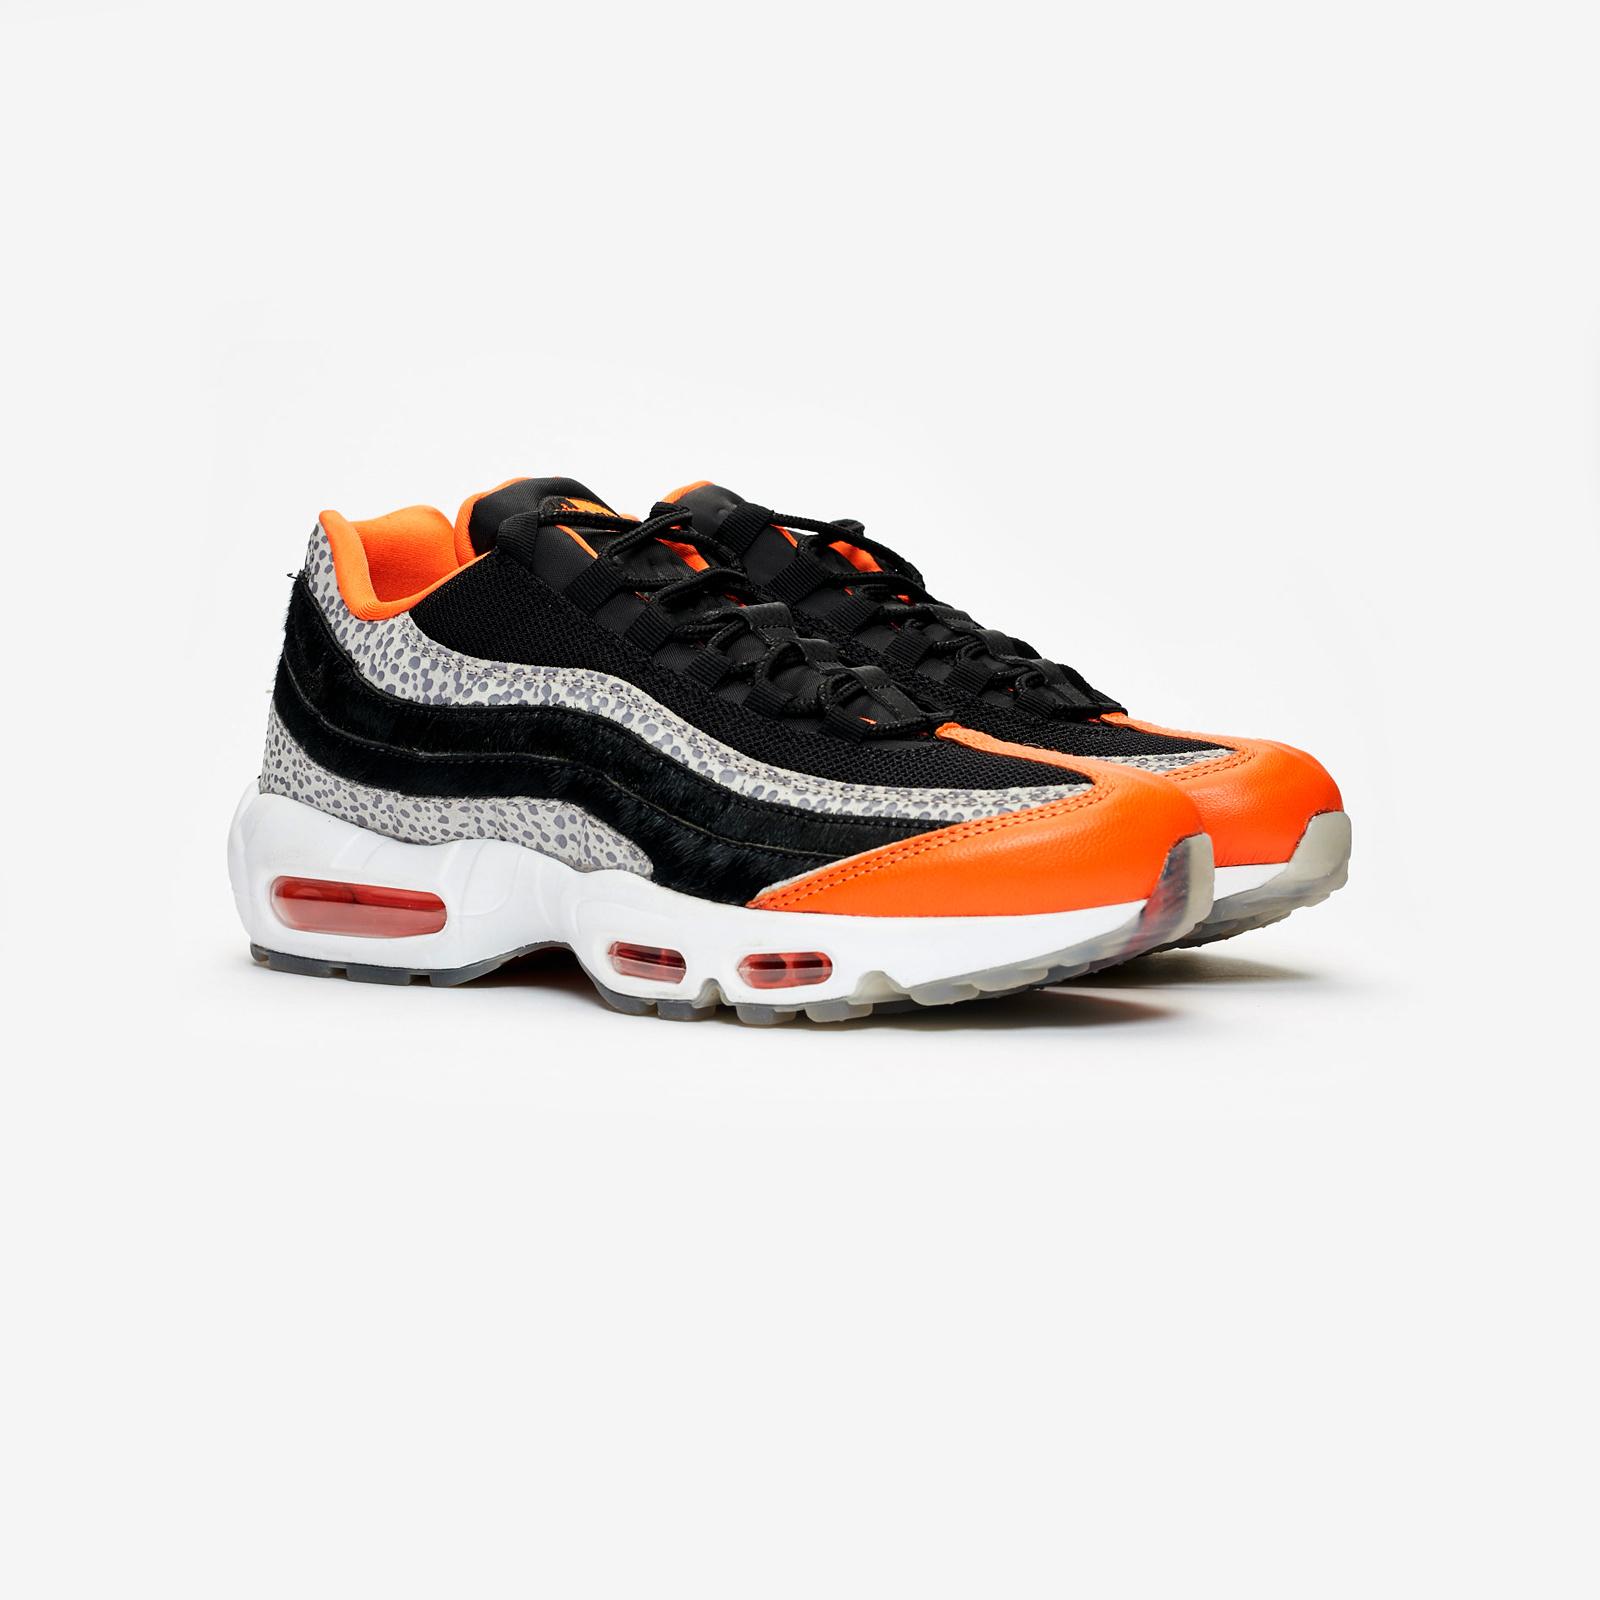 new style 129a0 8dabf Nike Sportswear Air Max 95